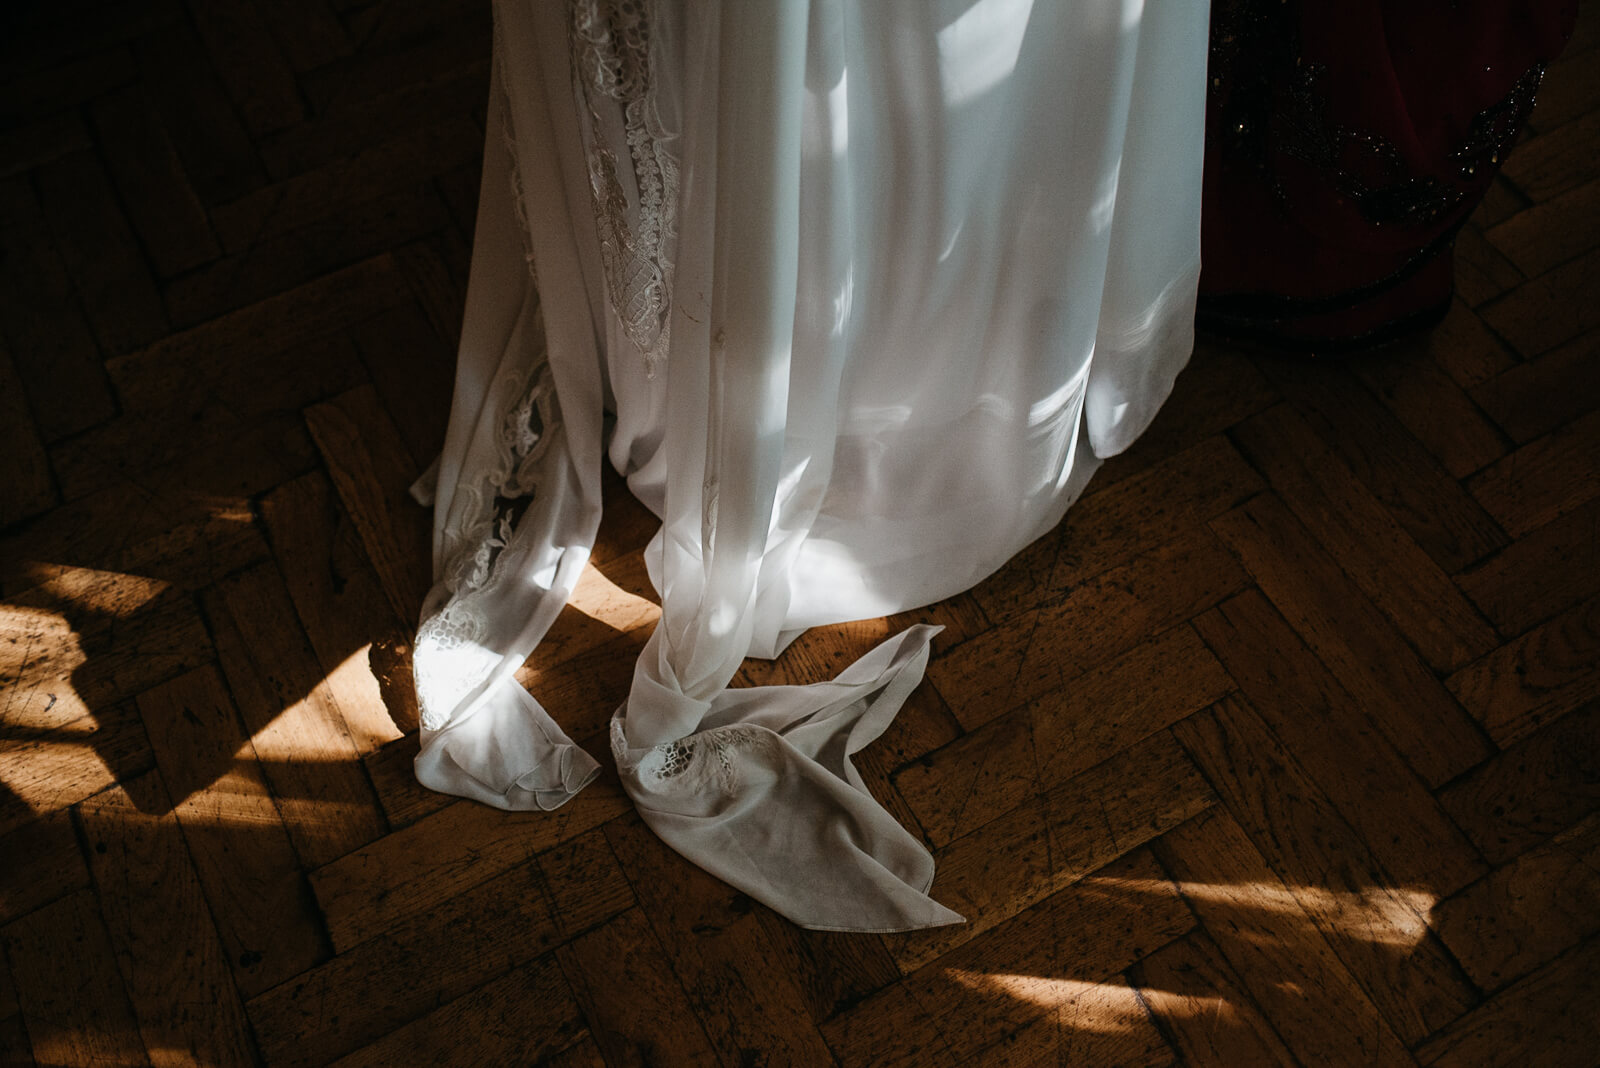 Brides chic stylish dress on parquet flooring at Marylebone One, London